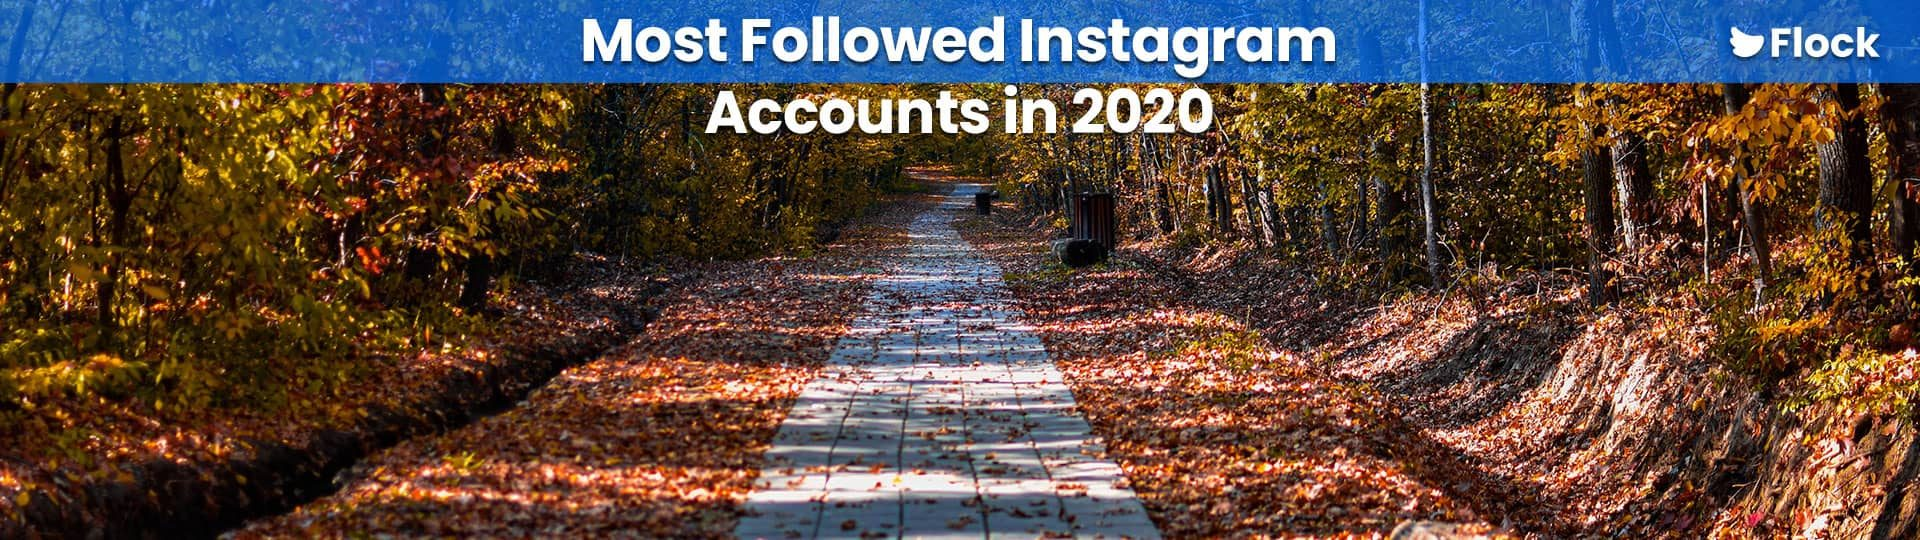 Most-Followed-2020